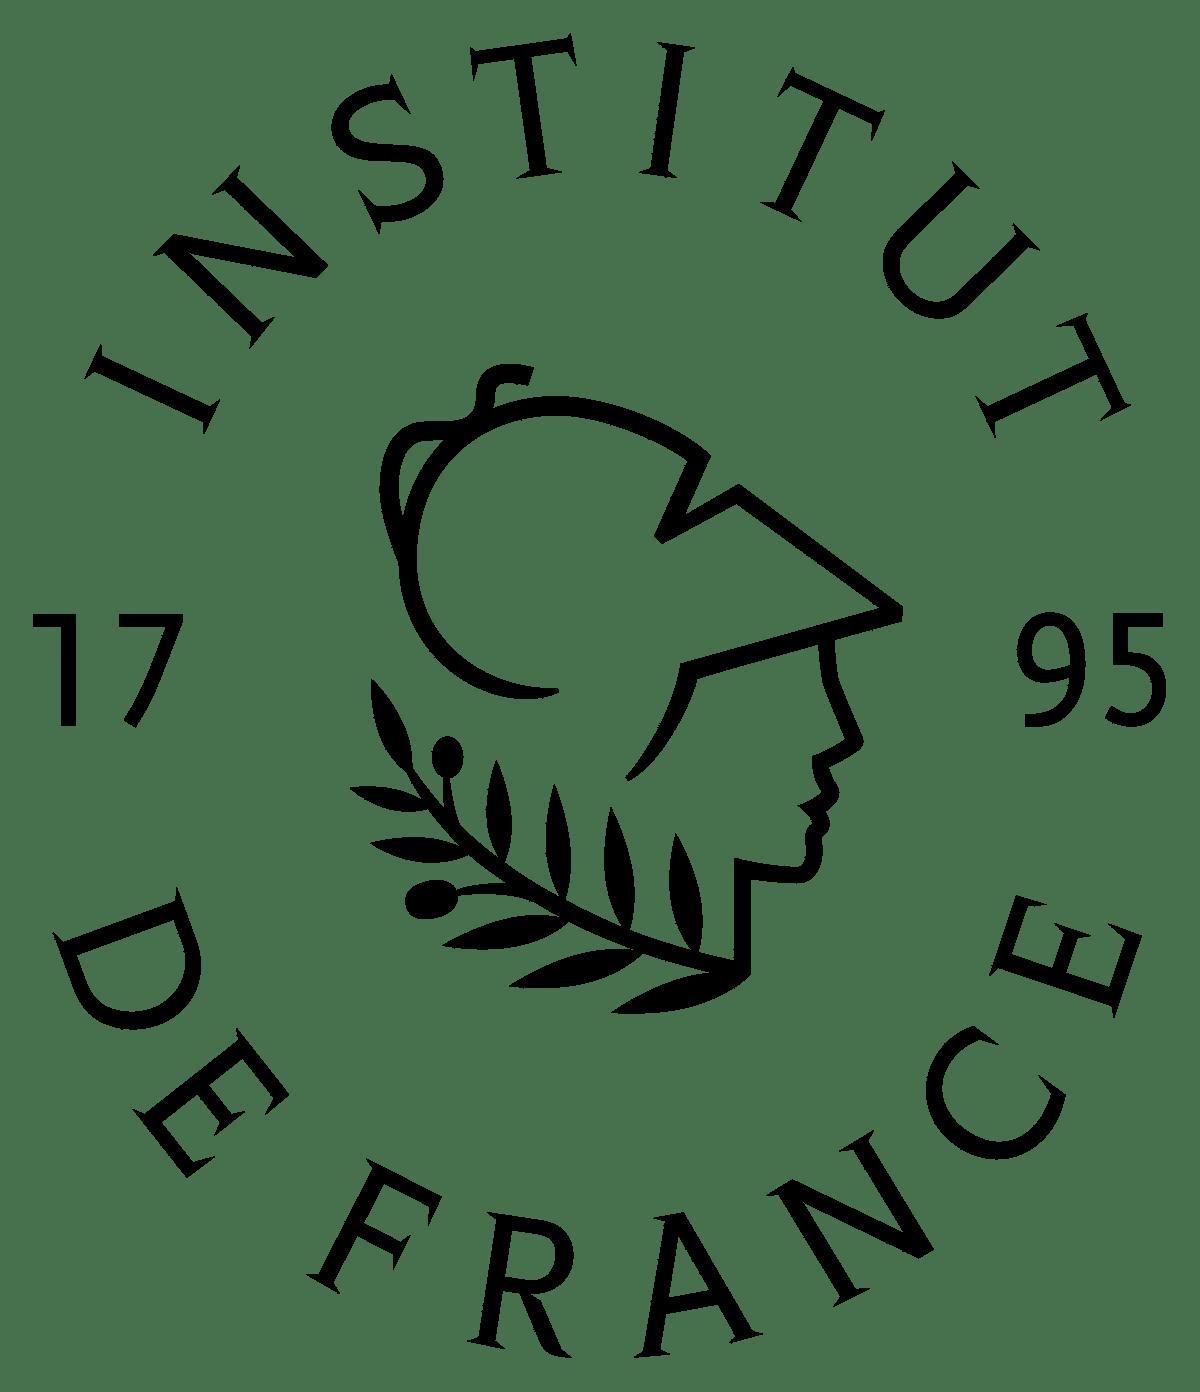 Institut de France logo